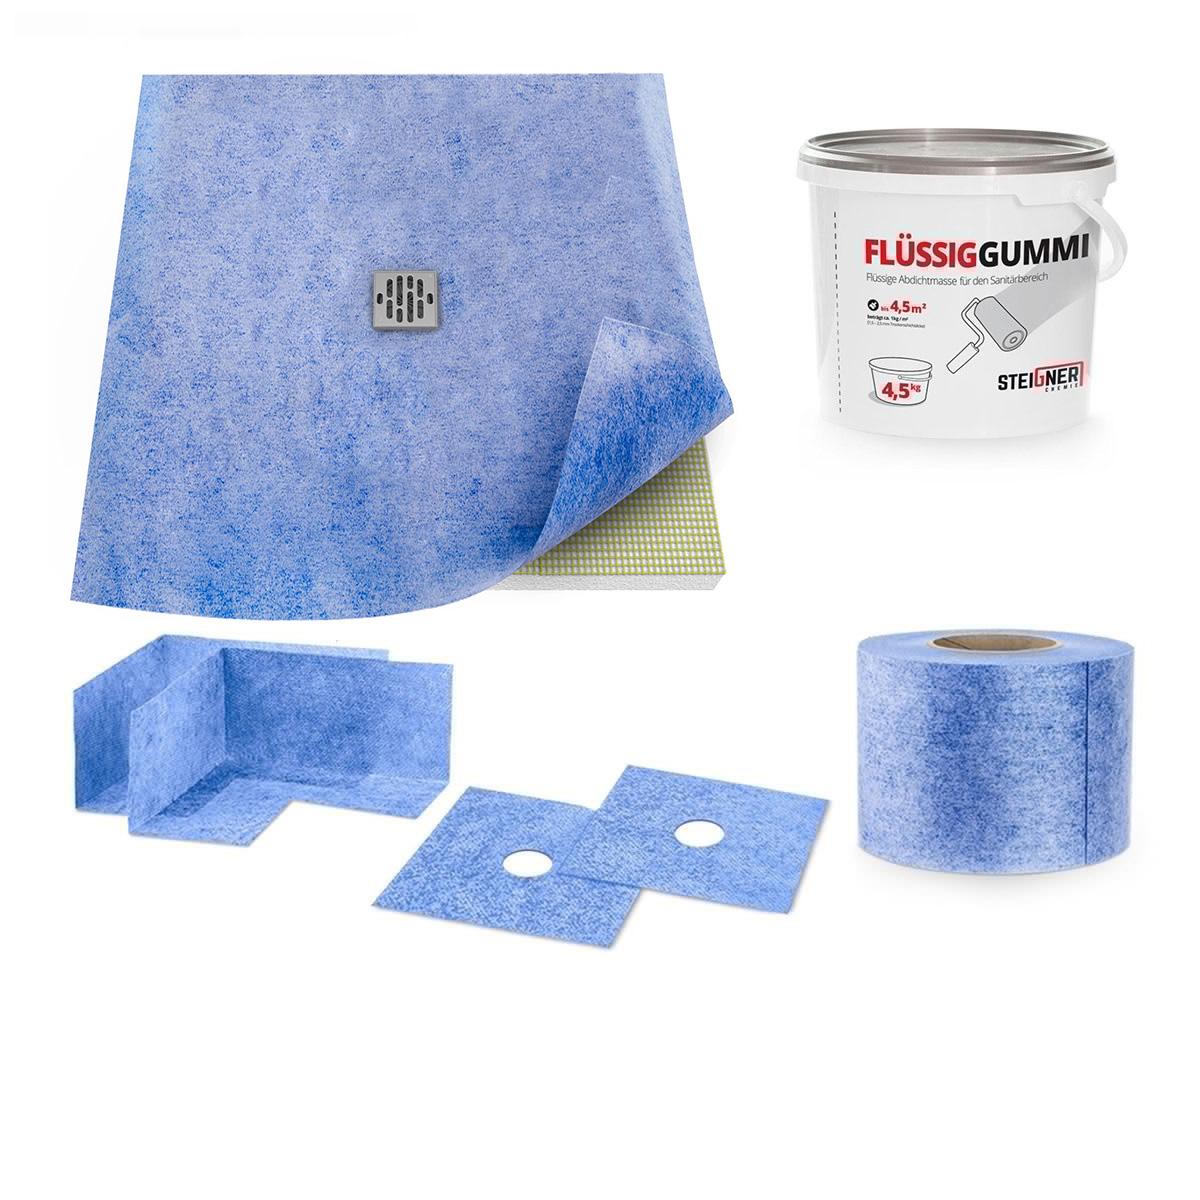 duschelement ebenerdig duschboard befliesbar duschtasse duschkabine edelstahl ebay. Black Bedroom Furniture Sets. Home Design Ideas